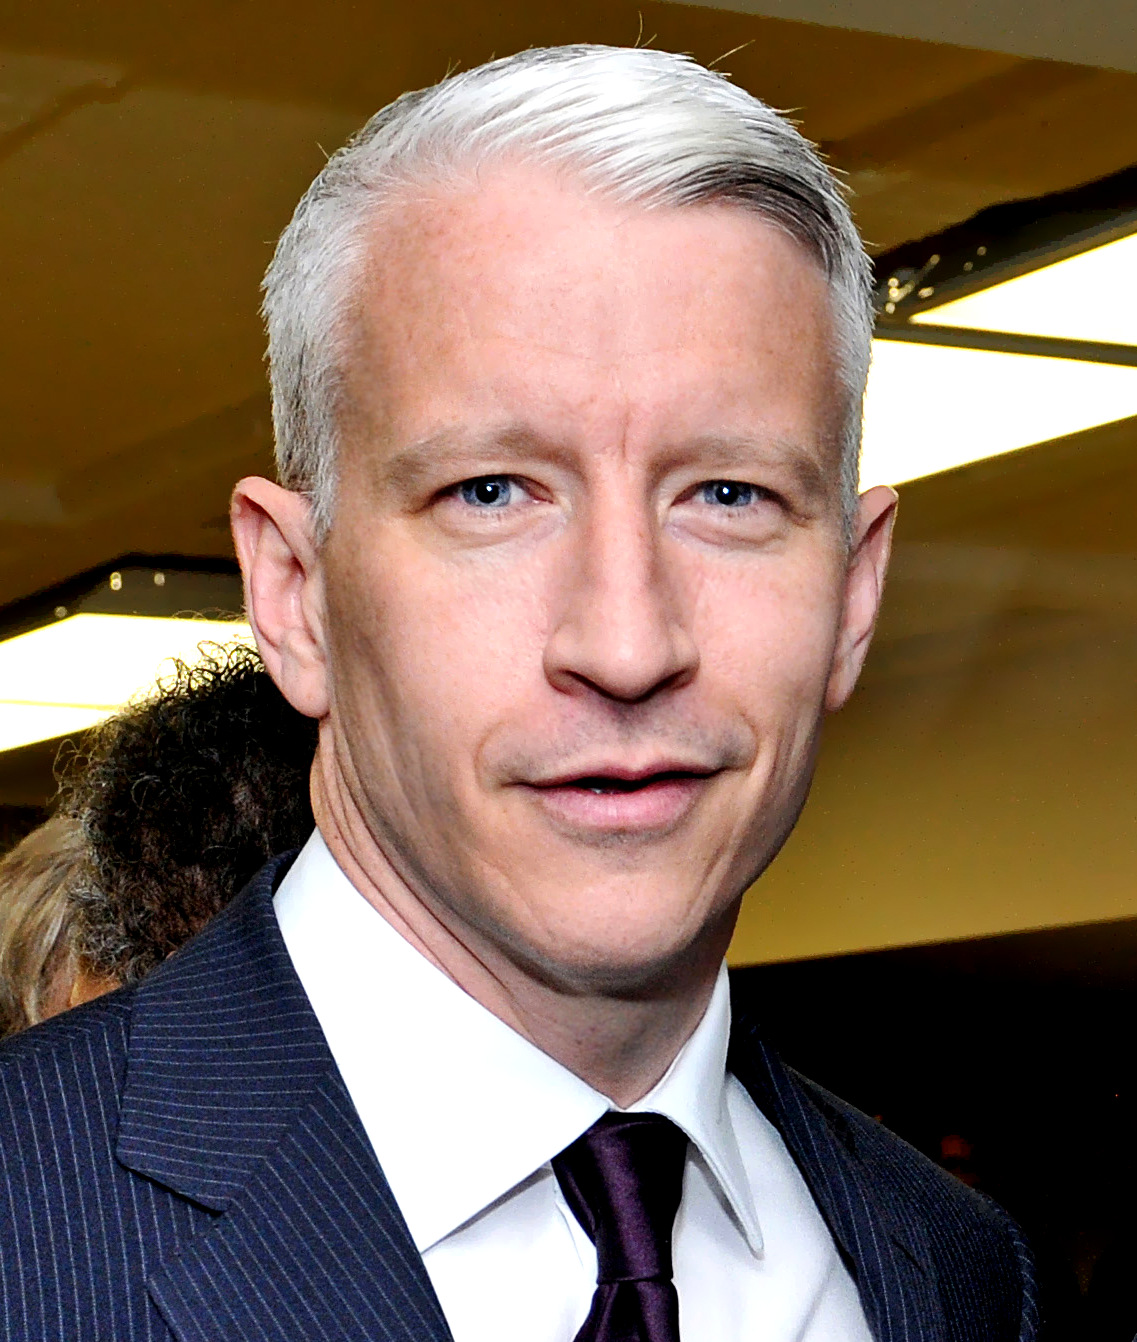 Anderson Cooper speaker